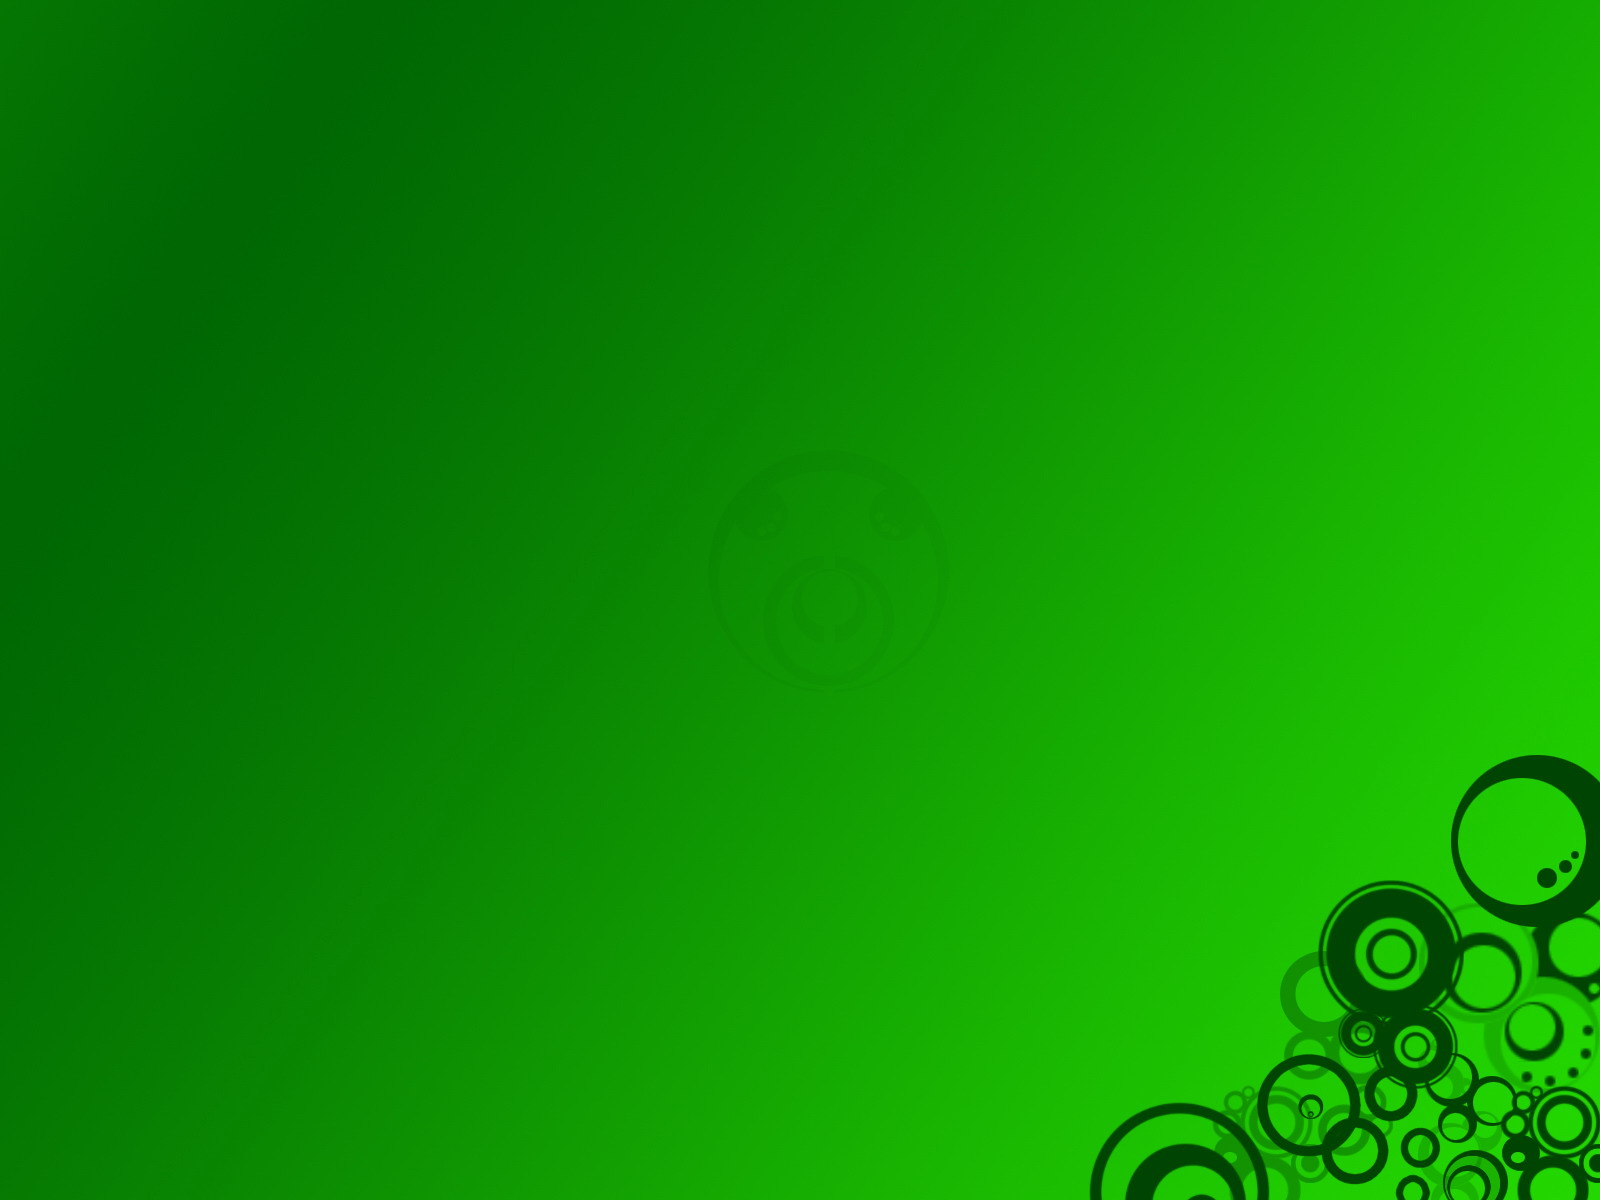 Cool Wallpaper High Resolution Green - green-and-black-wallpapers-11-hd-wallpaper  Photograph_218268.jpg